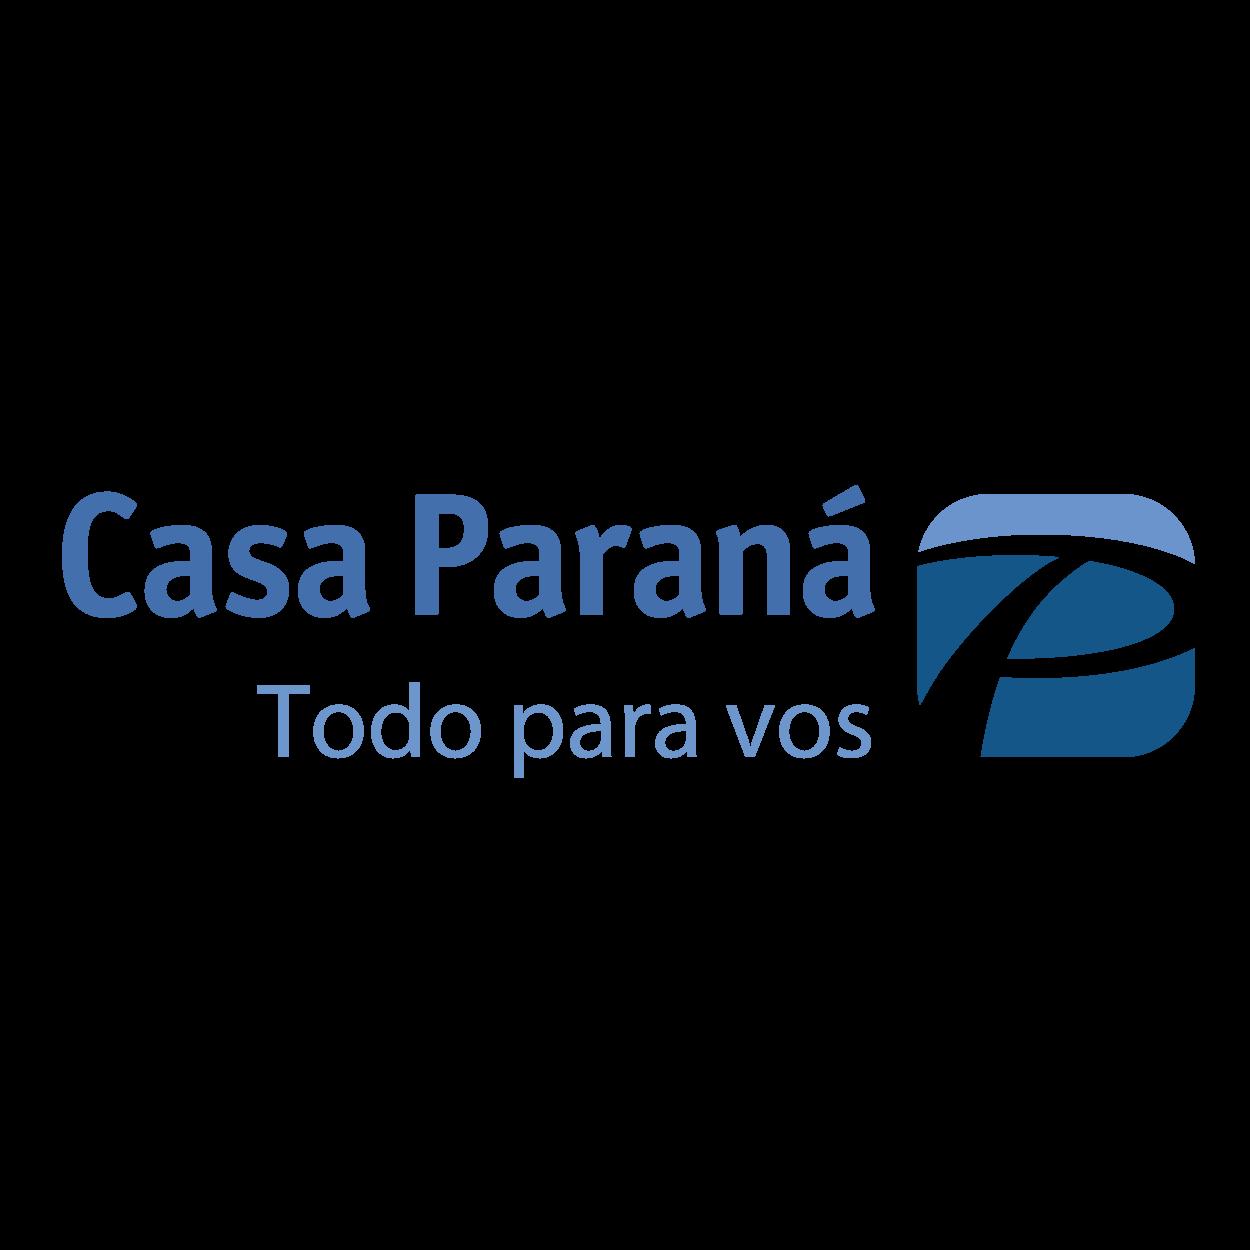 Casa Paraná